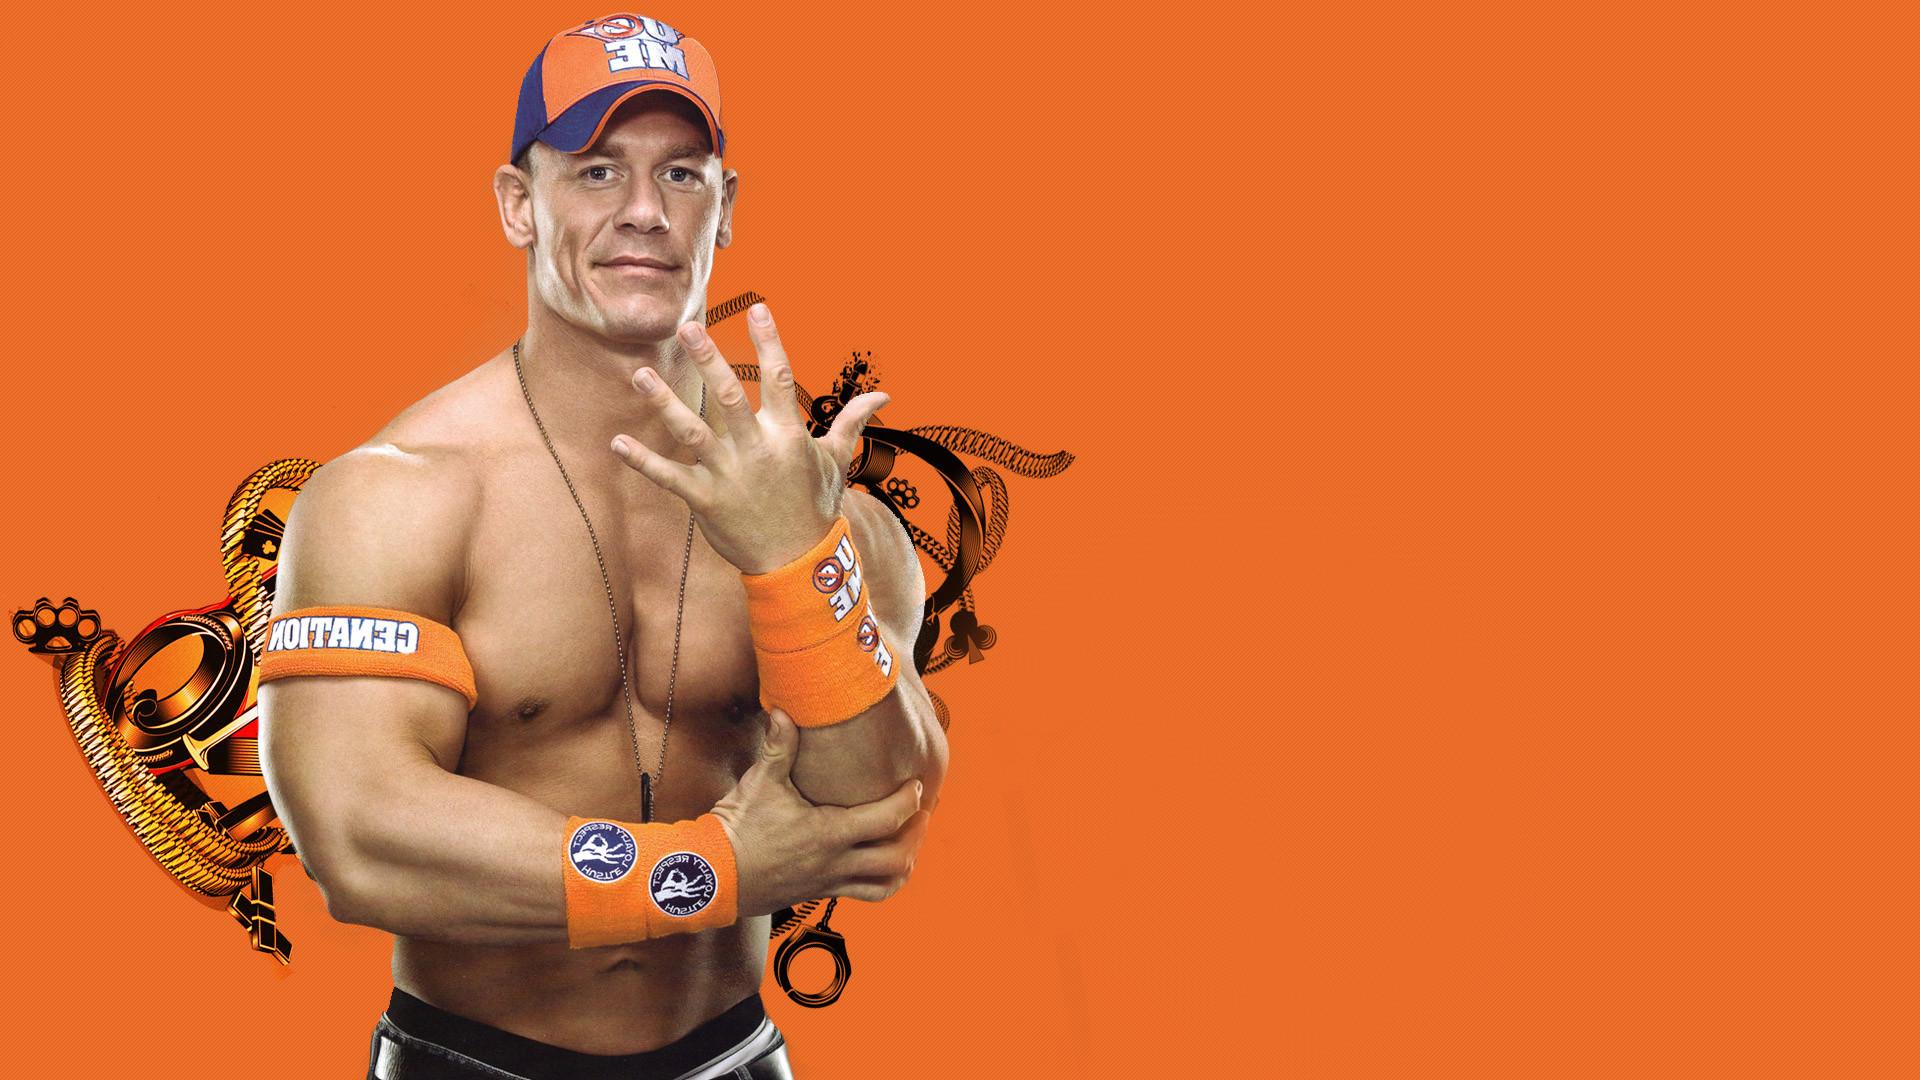 John Cena New Hd Wallpapers 1366×768 John Cena Hd Wallpaper (59 Wallpapers)